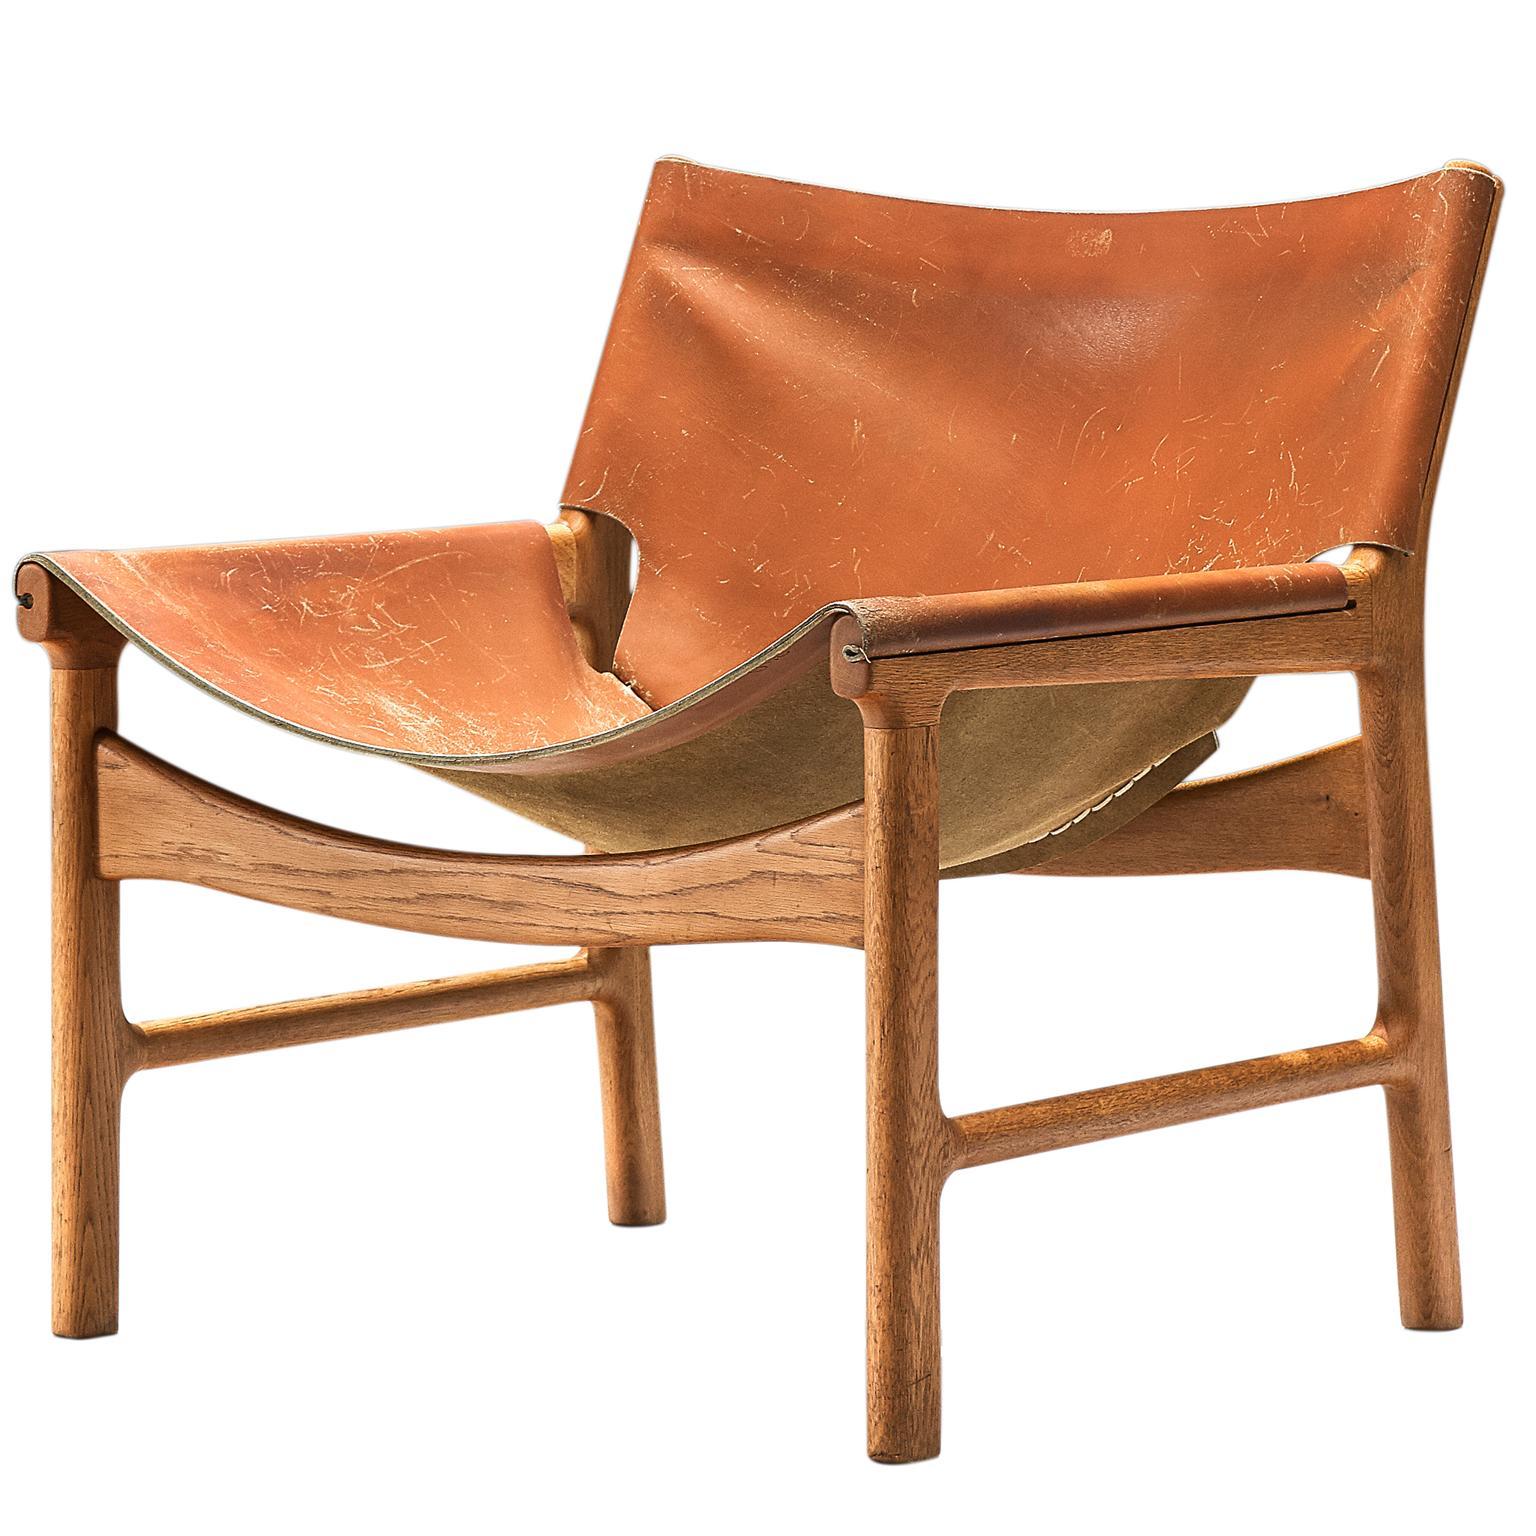 Illum Wikkelsø Lounge Chair in Cognac Leather and Oak